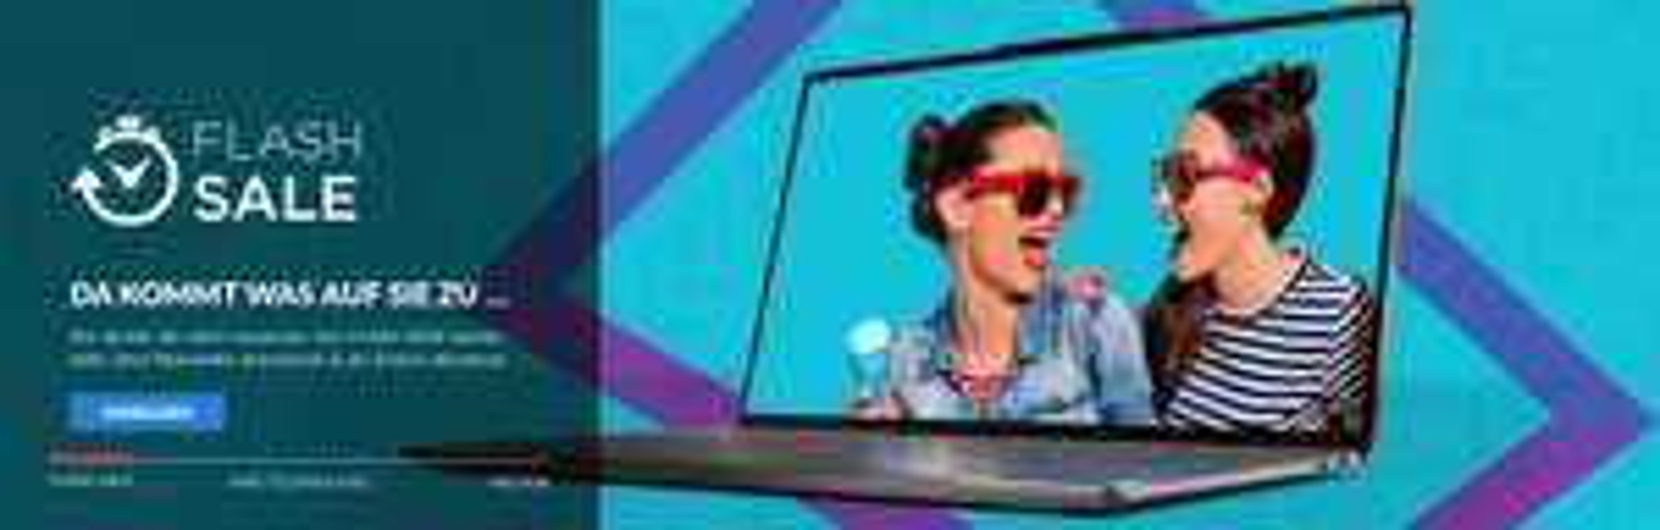 12% Flash Sale bei Lenovo z.B. mit dem Lenovo ThinkPad L13 Yoga